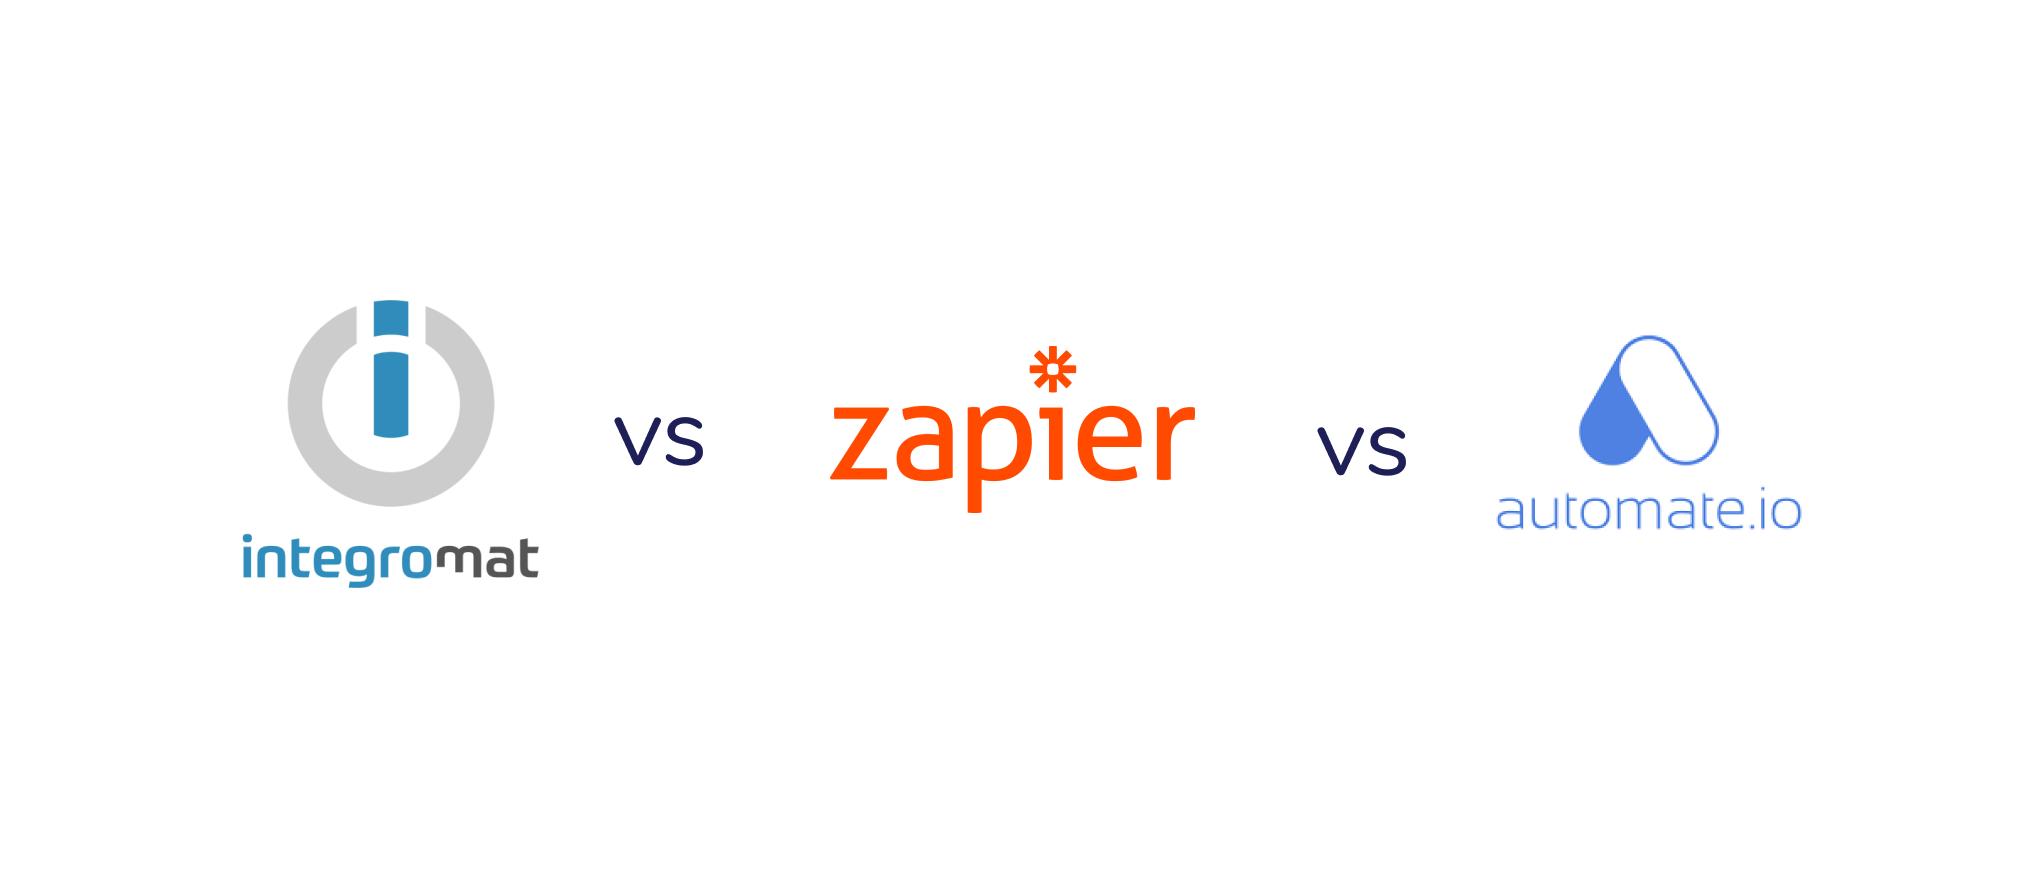 Integromat vs Zapier vs Automate.io